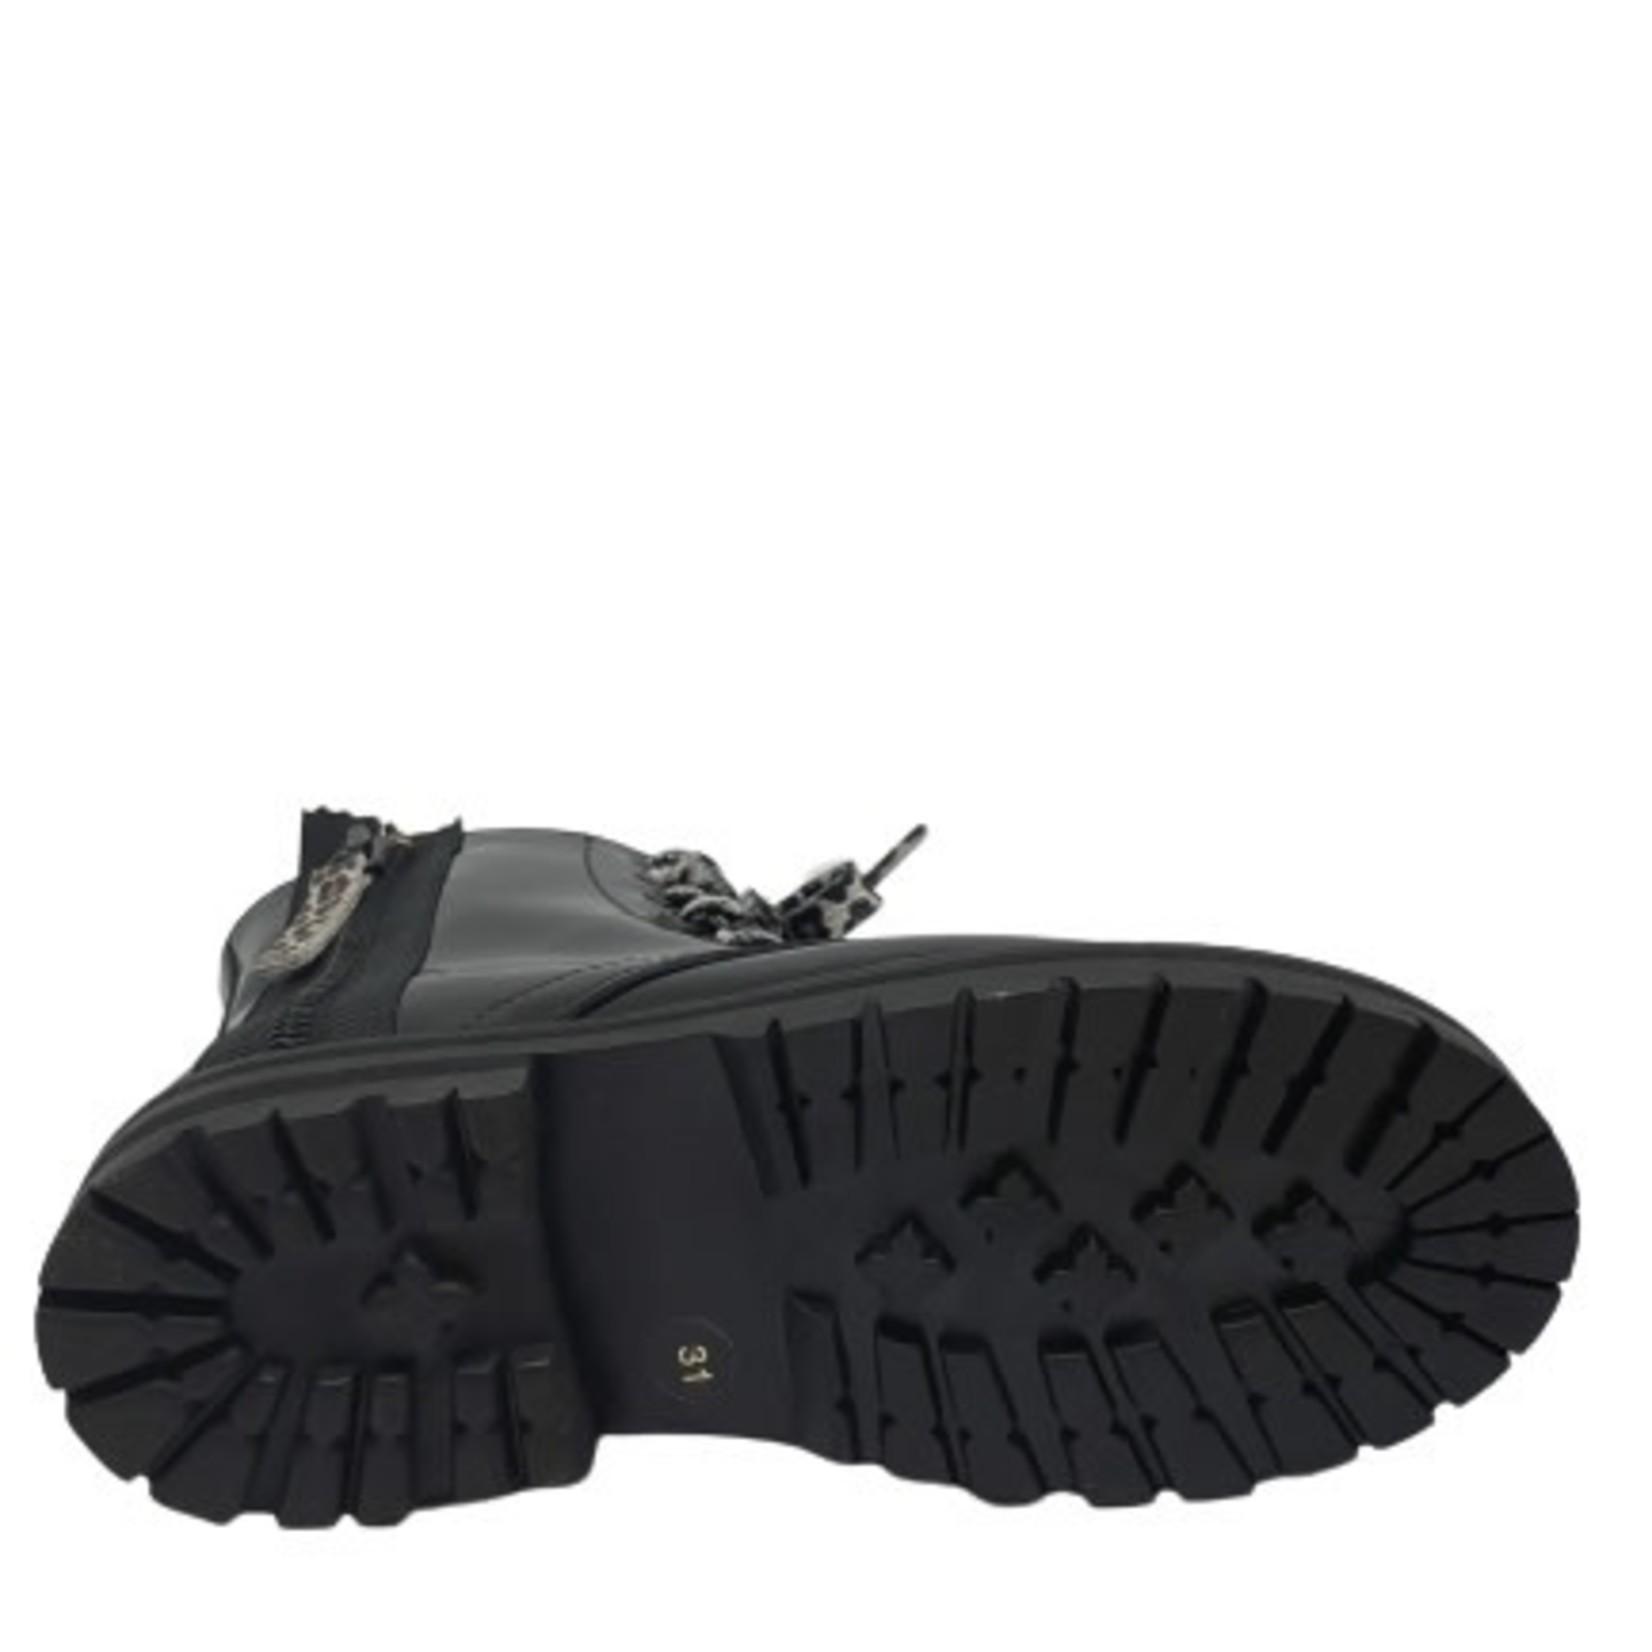 Hoge schoen Zwart lak